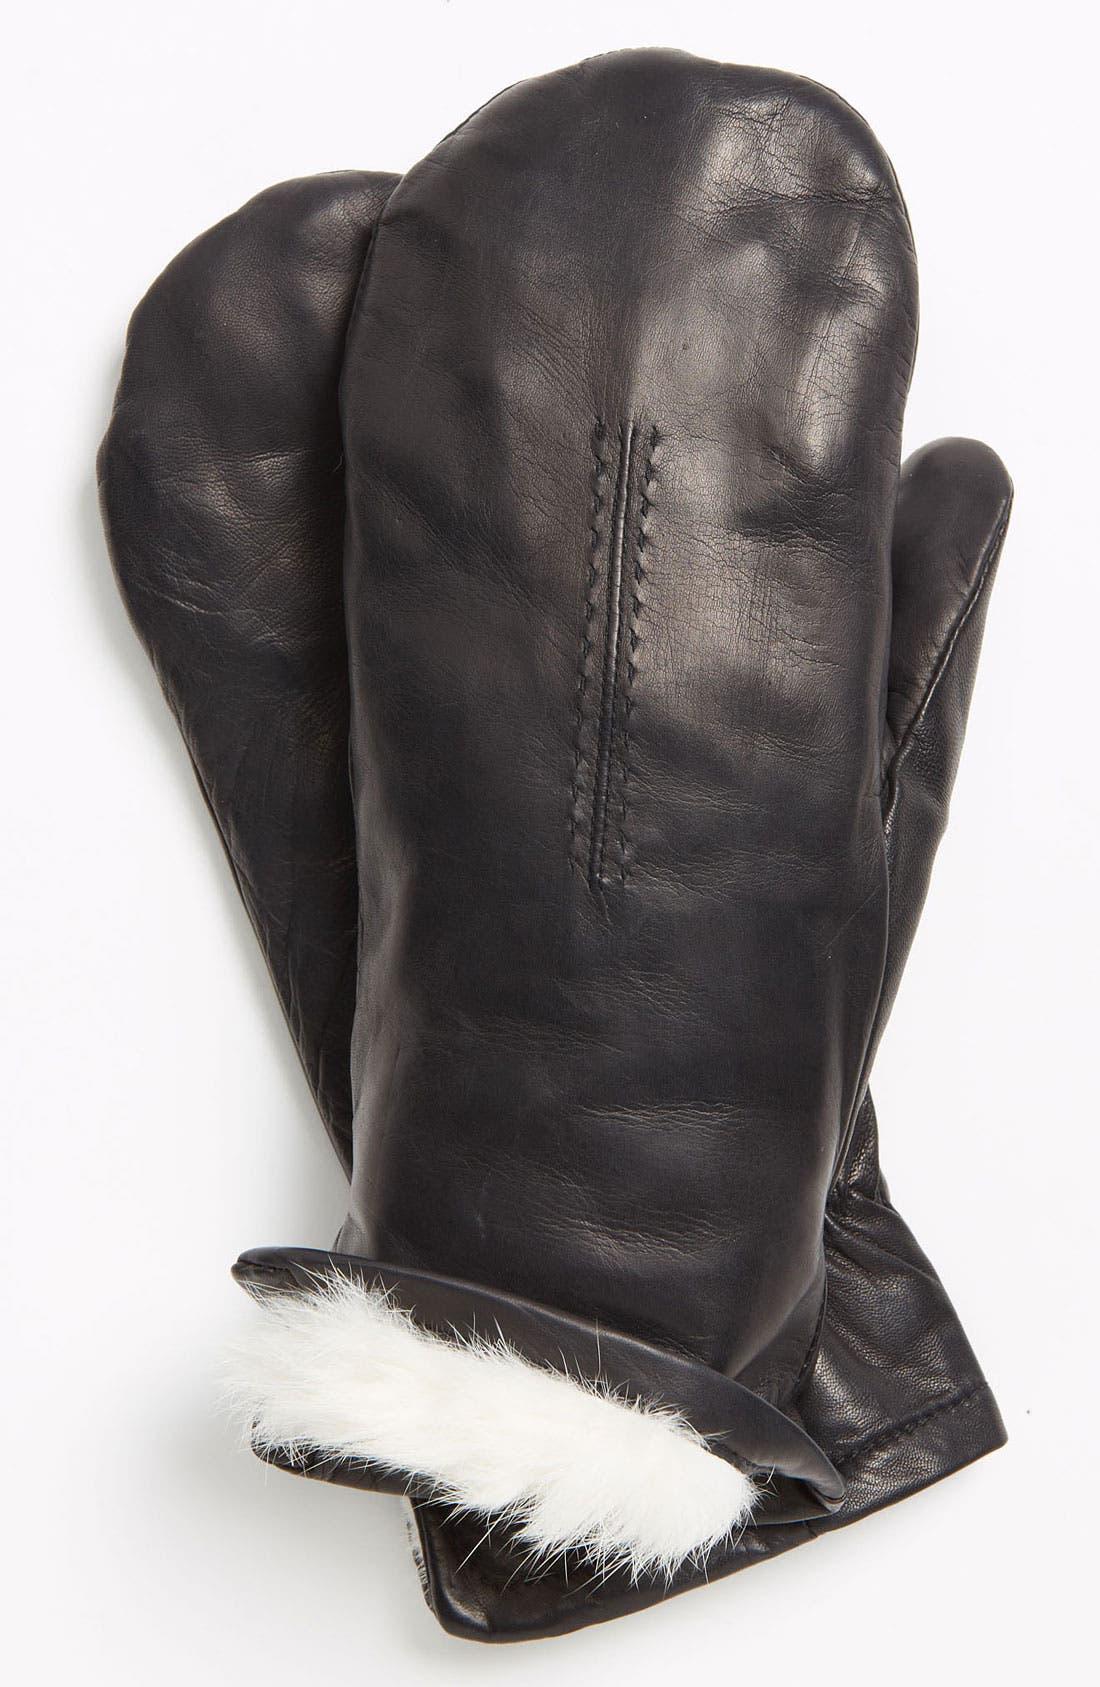 GRANDOE GLOVES Grandoe 'Bunny' Genuine Rabbit Fur Lined Leather Mittens, Main, color, 001